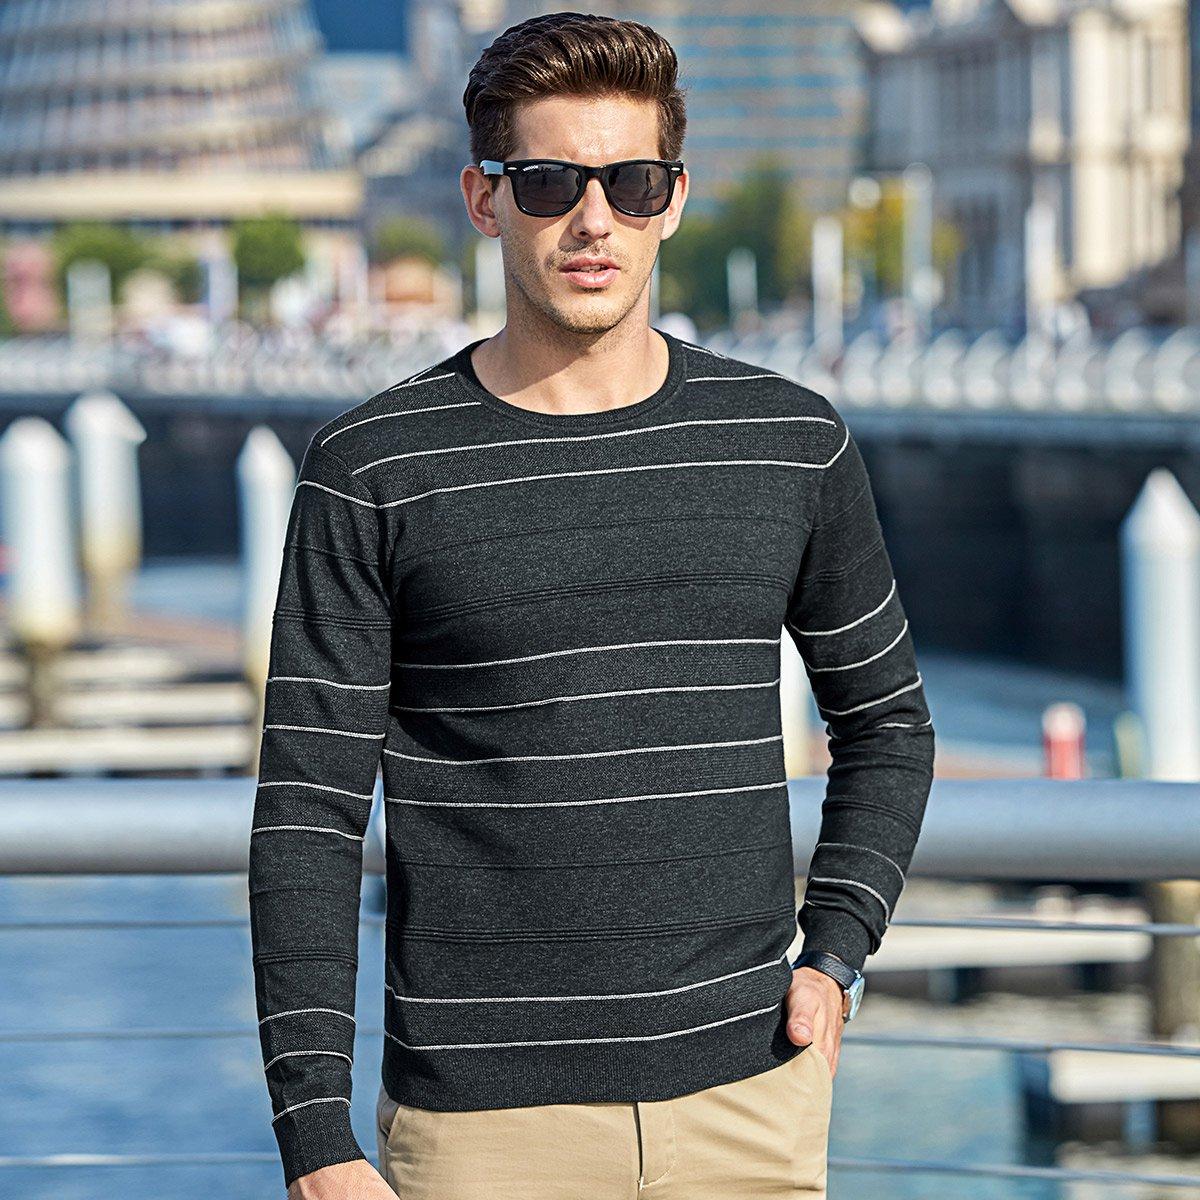 SOUREPOSE 2019秋冬款条纹套头长袖休闲打底衫上衣男士毛衣针织衫轻商务